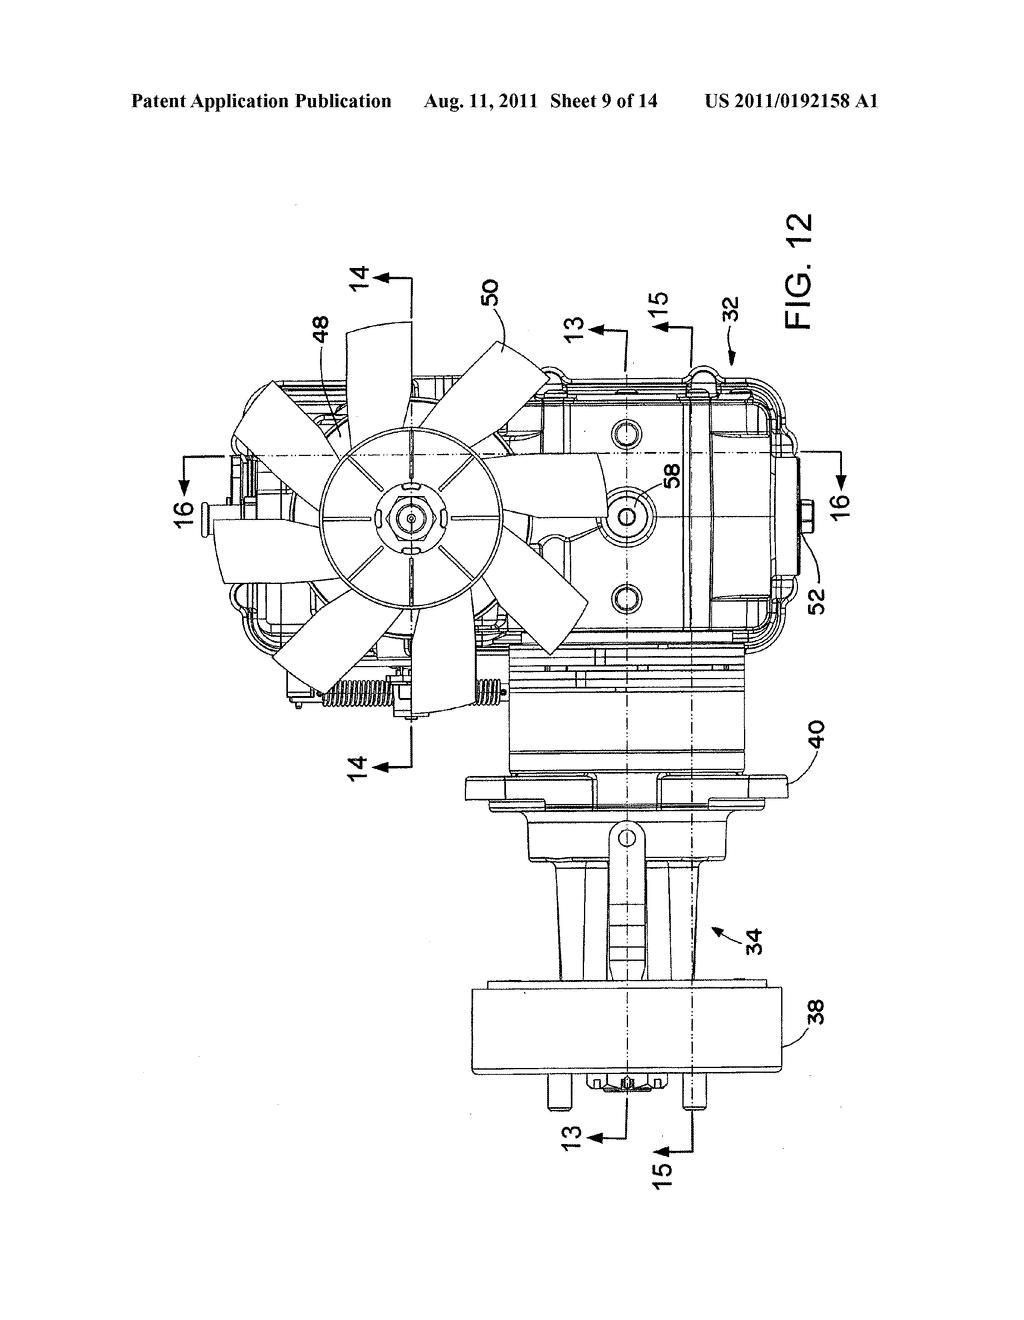 integrated hydrostatic transmission diagram, schematic, and image 10 Gravely Hydrostatic Transmission Diagram